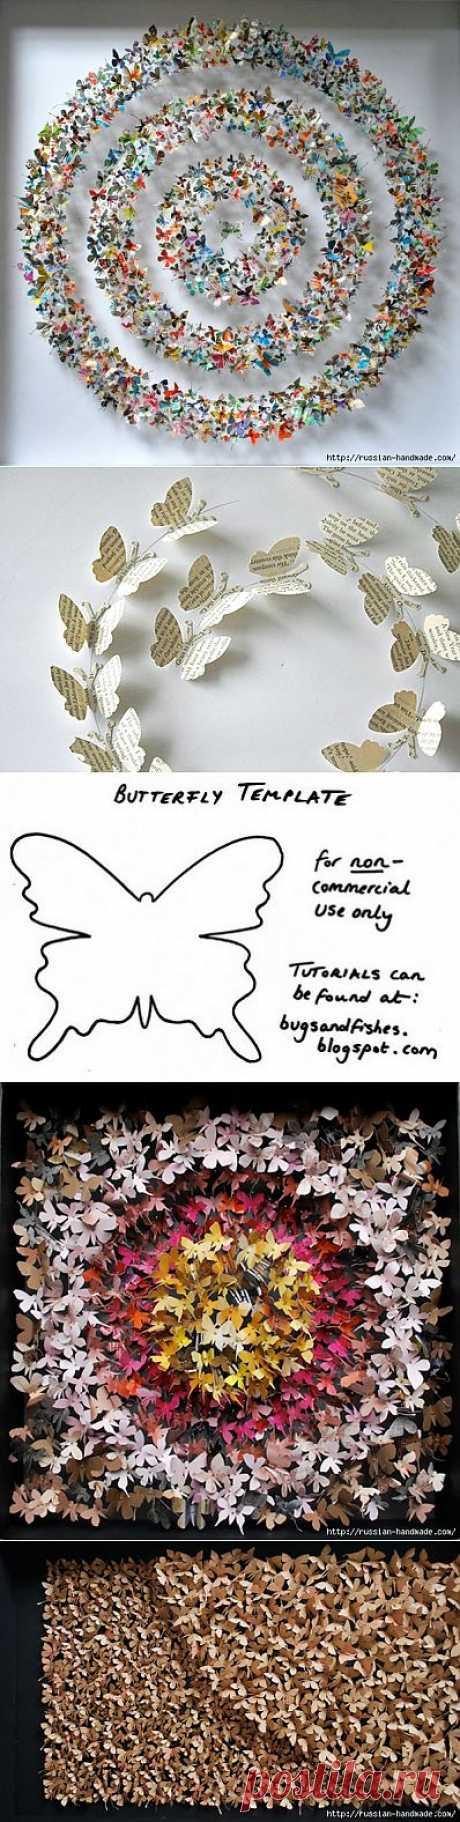 Бумажные бабочки в интерьере. Шаблон бабочки.